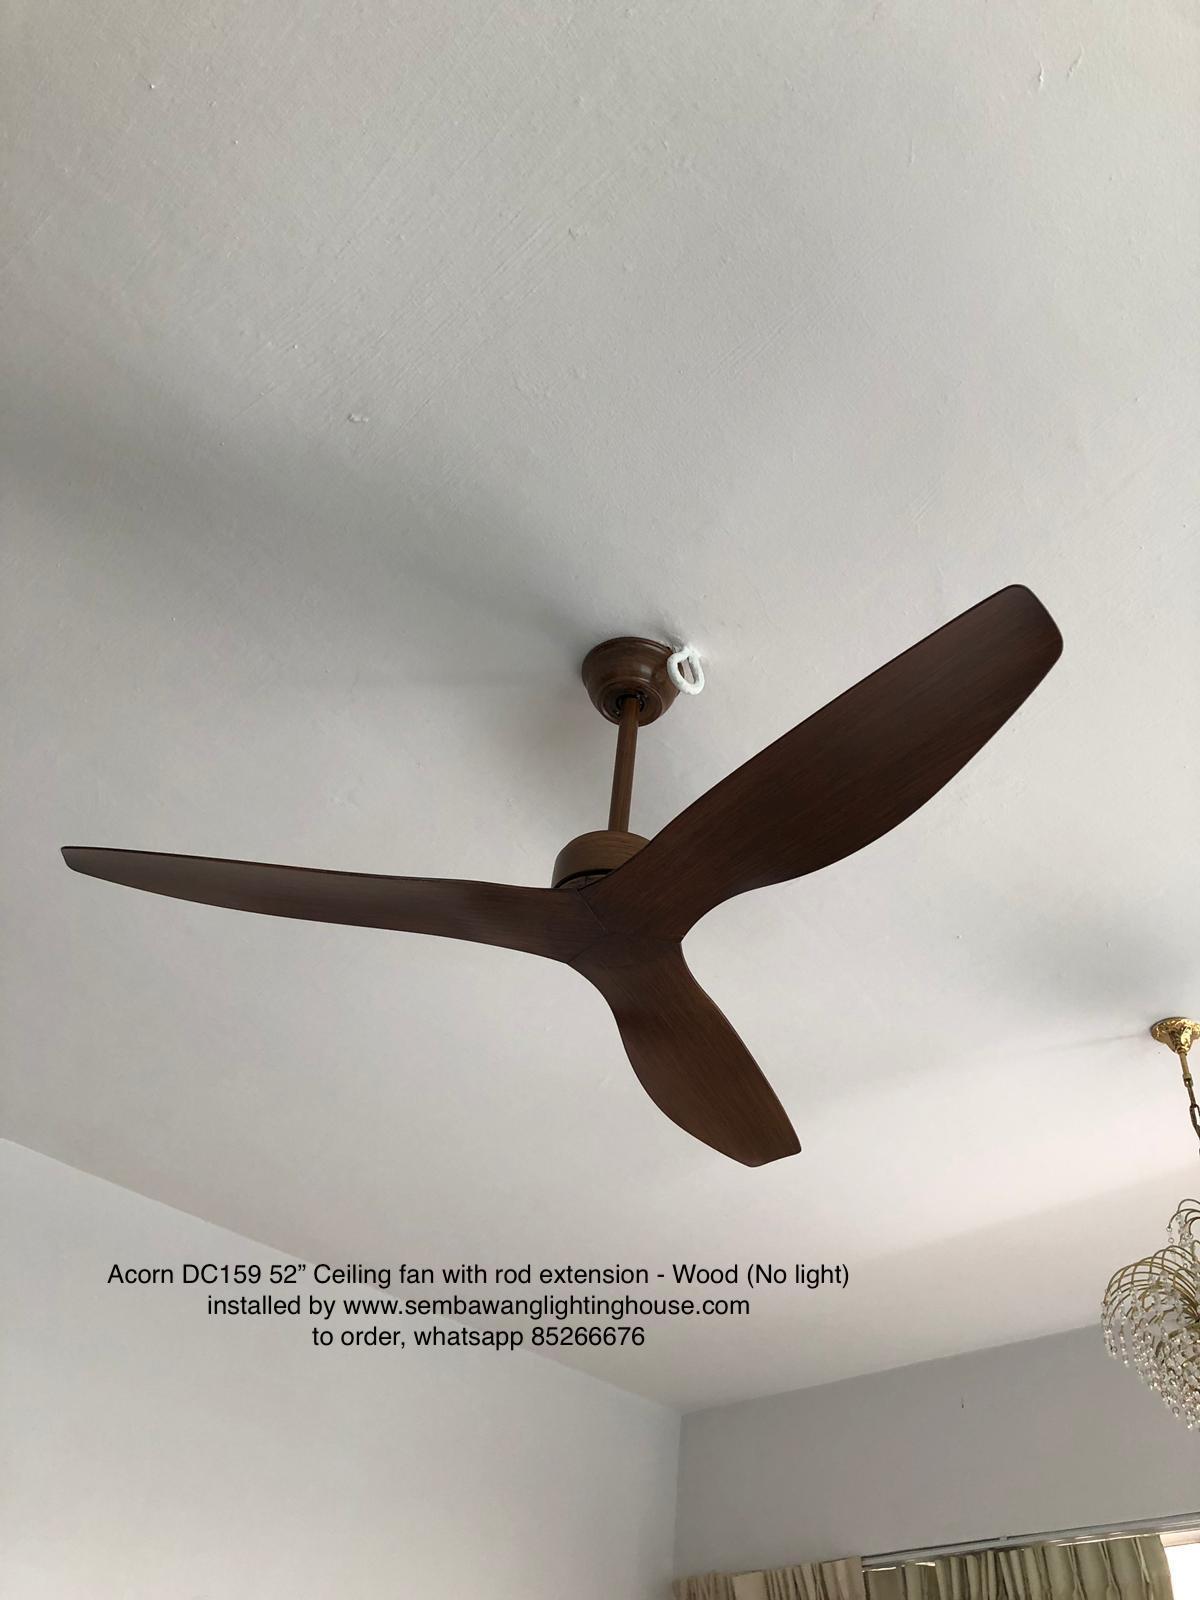 sample05-acorn-dc159-52-22-ceiling-fan-no-light-wood-sembawang-lighting-house.jpeg